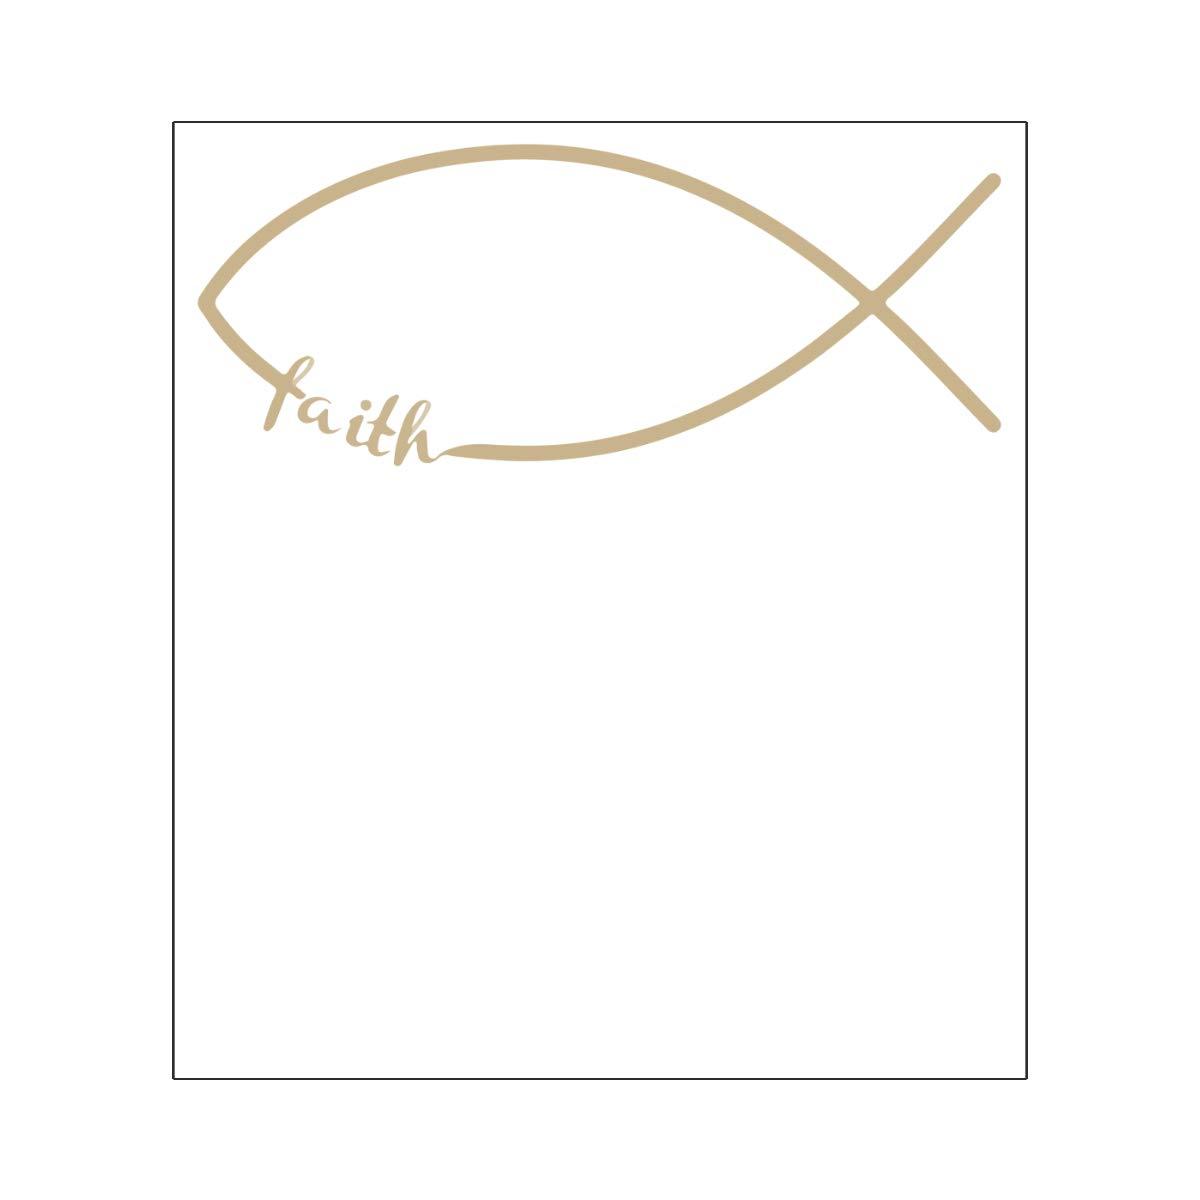 Harataki Jesus Faith Fish Unisex-Baby Newborn Short-Sleeve Bodysuit Rompers